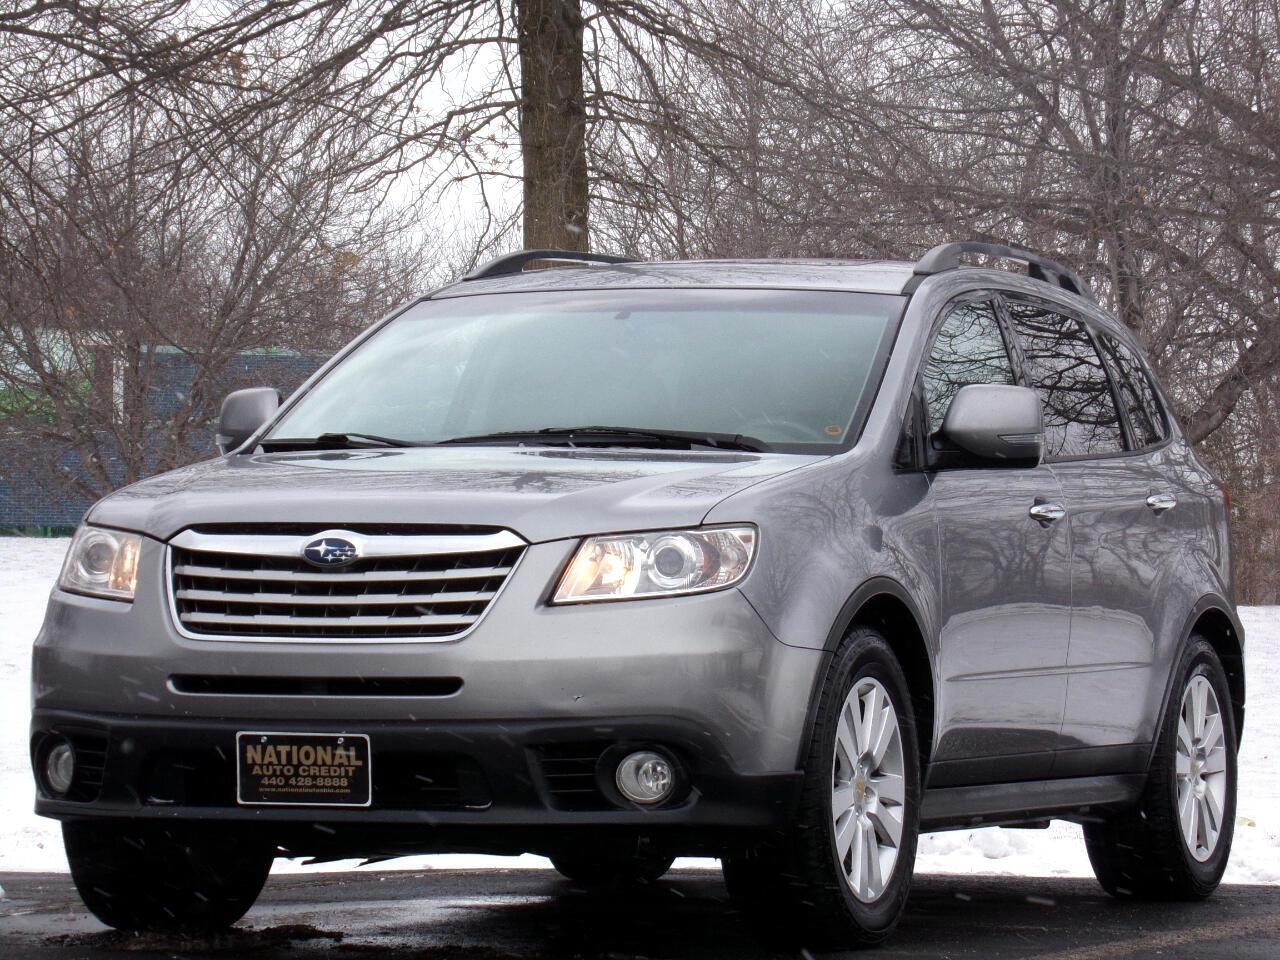 Subaru Tribeca Limited 7-Passenger 2009